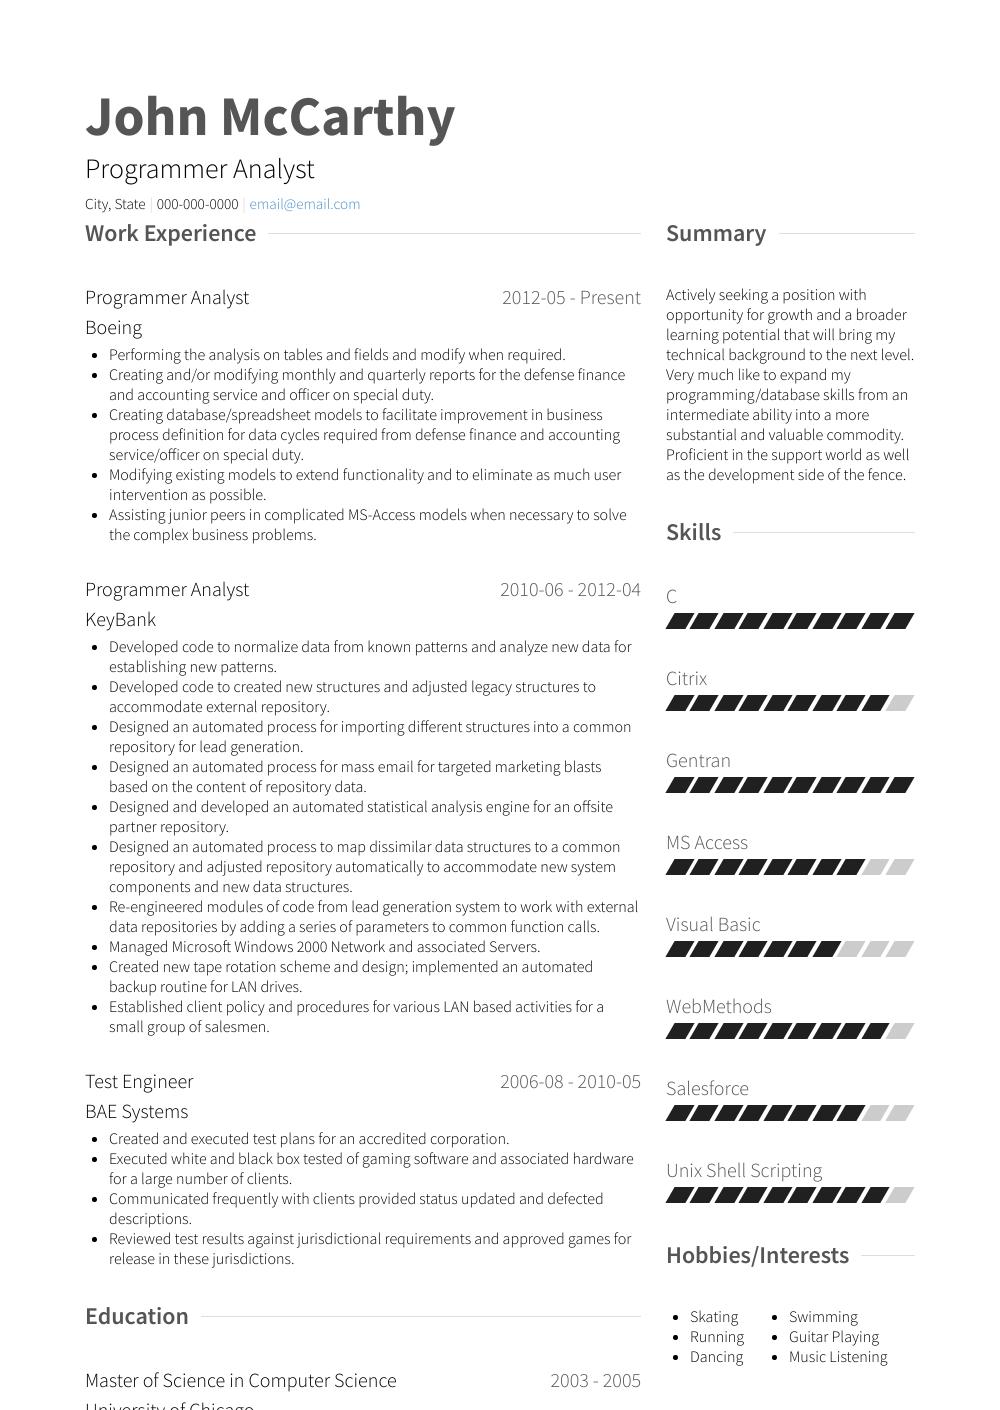 Programmer Analyst  Resume Samples  Templates  VisualCV